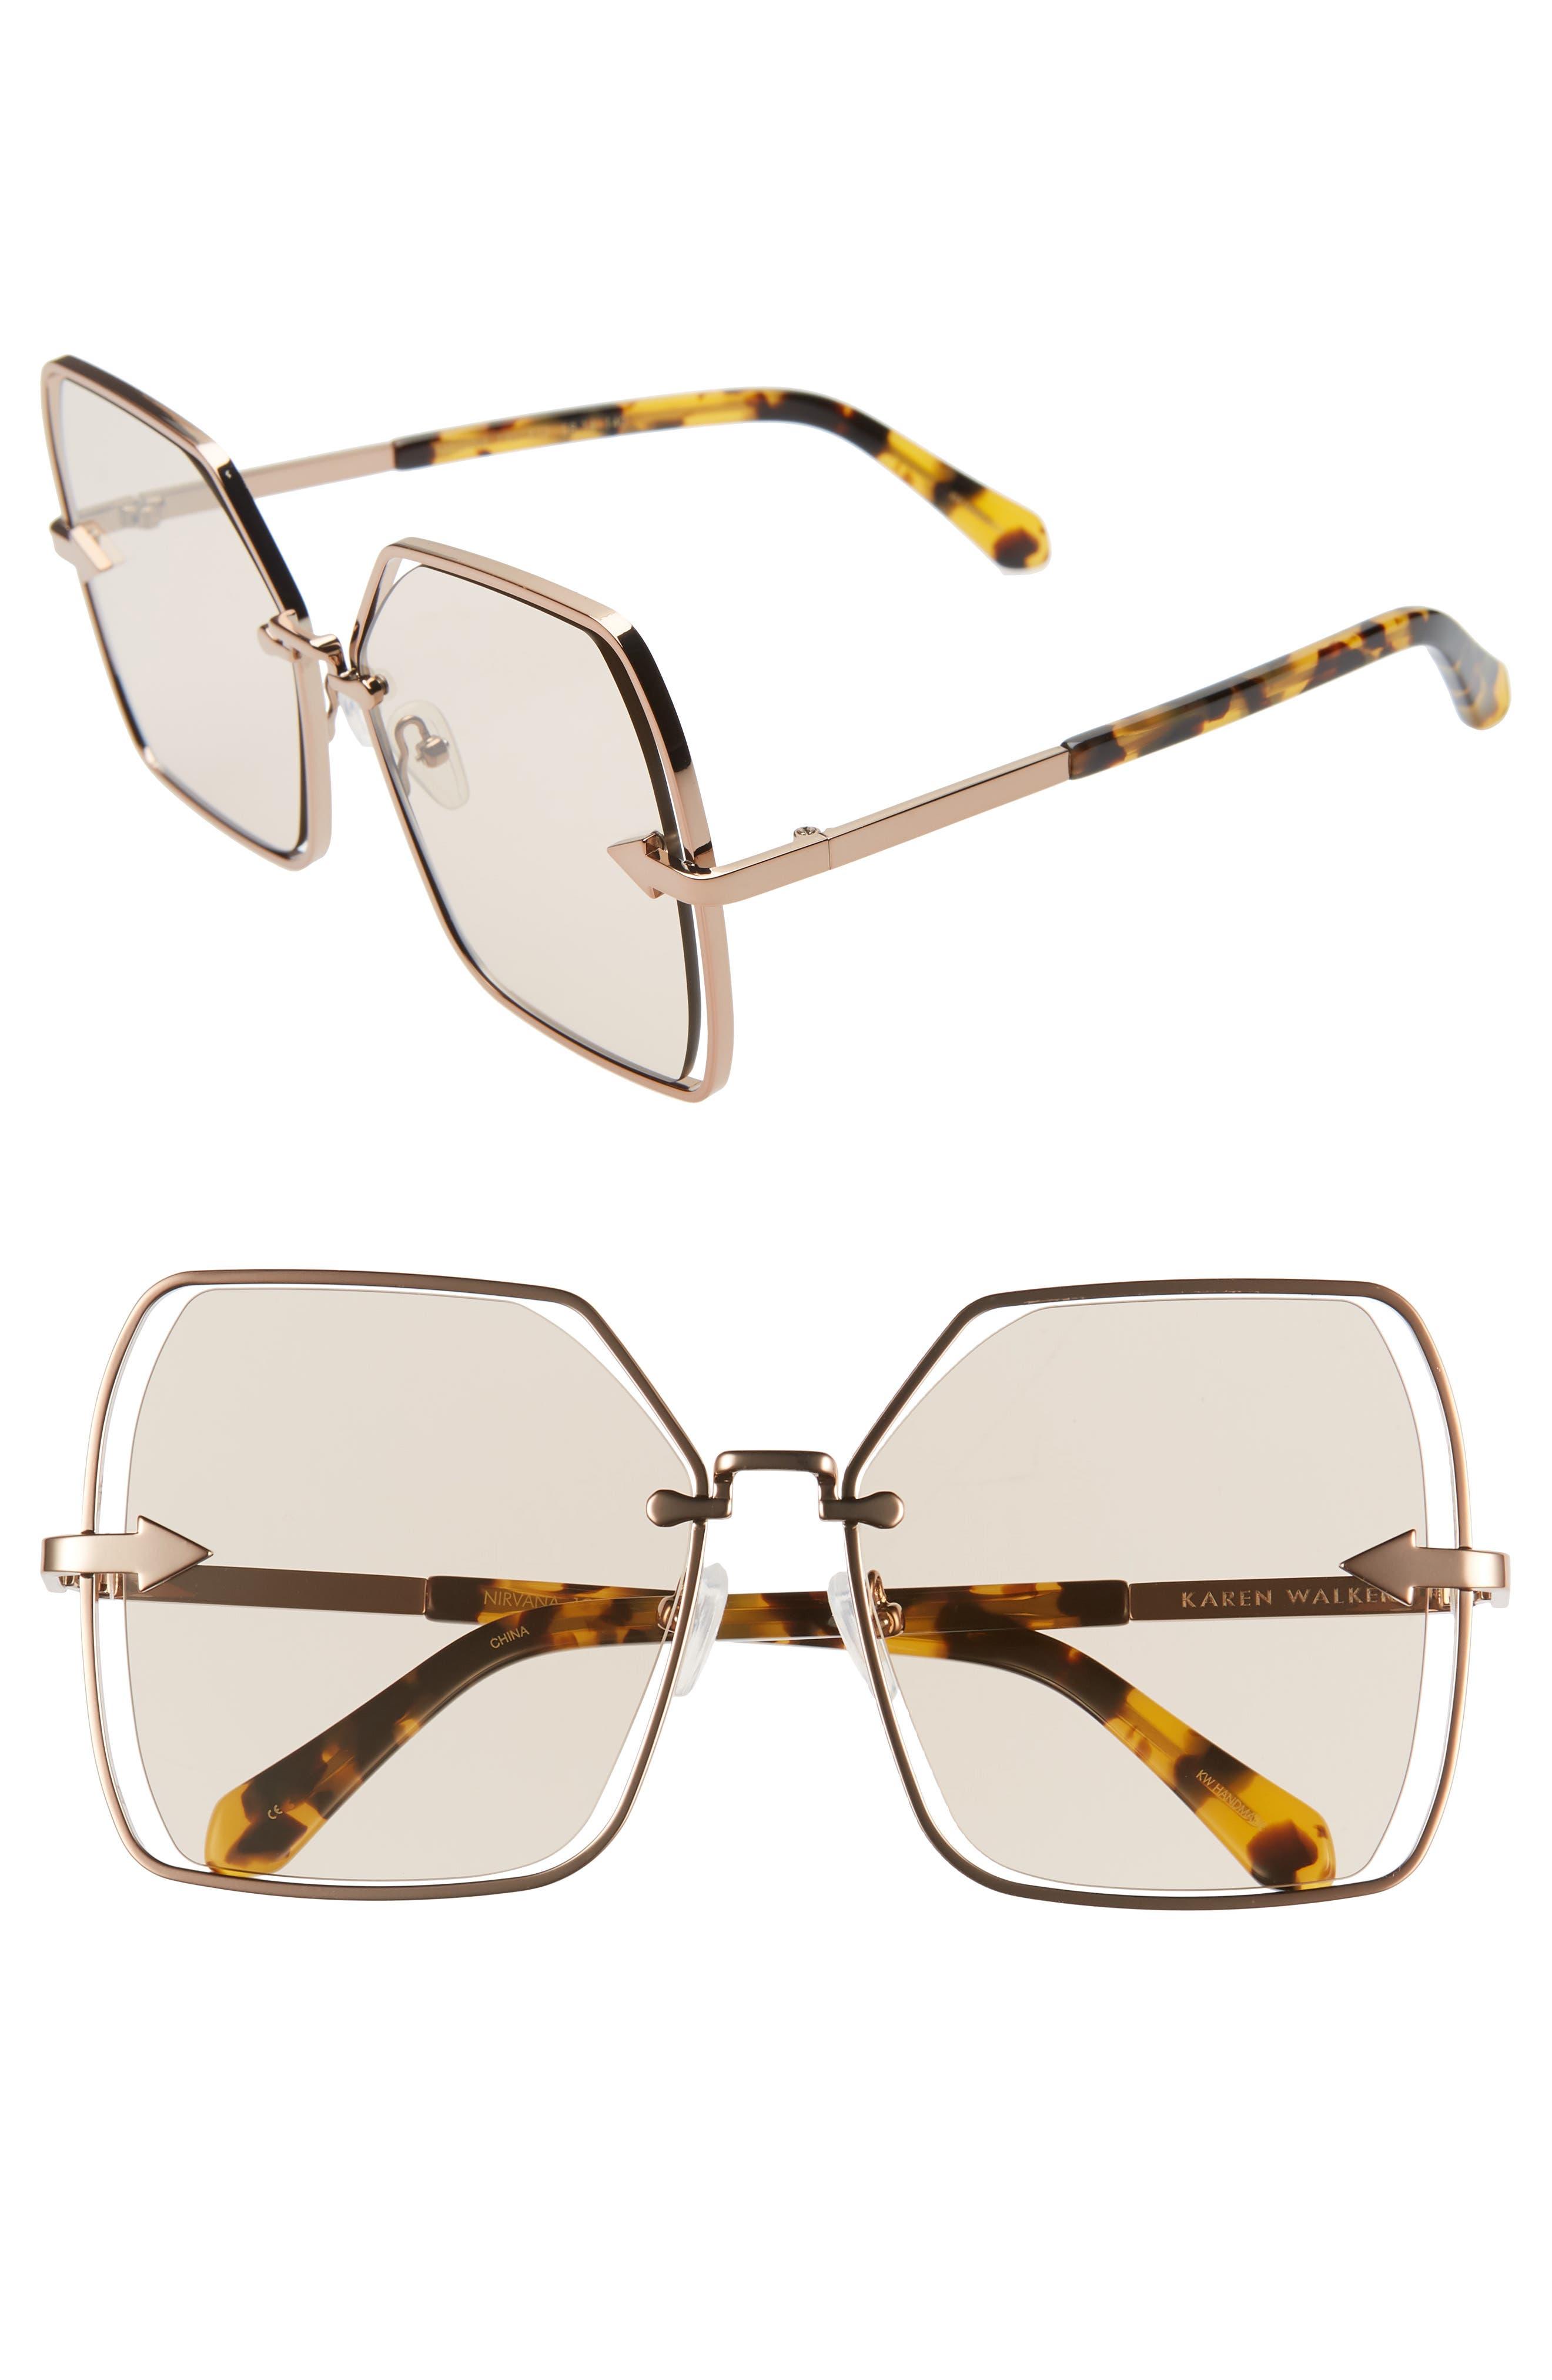 Karen Walker Sunglasses NIRVANA 58MM SQUARE BUTTERFLY SUNGLASSES - DARK GOLD/ TAN TINT